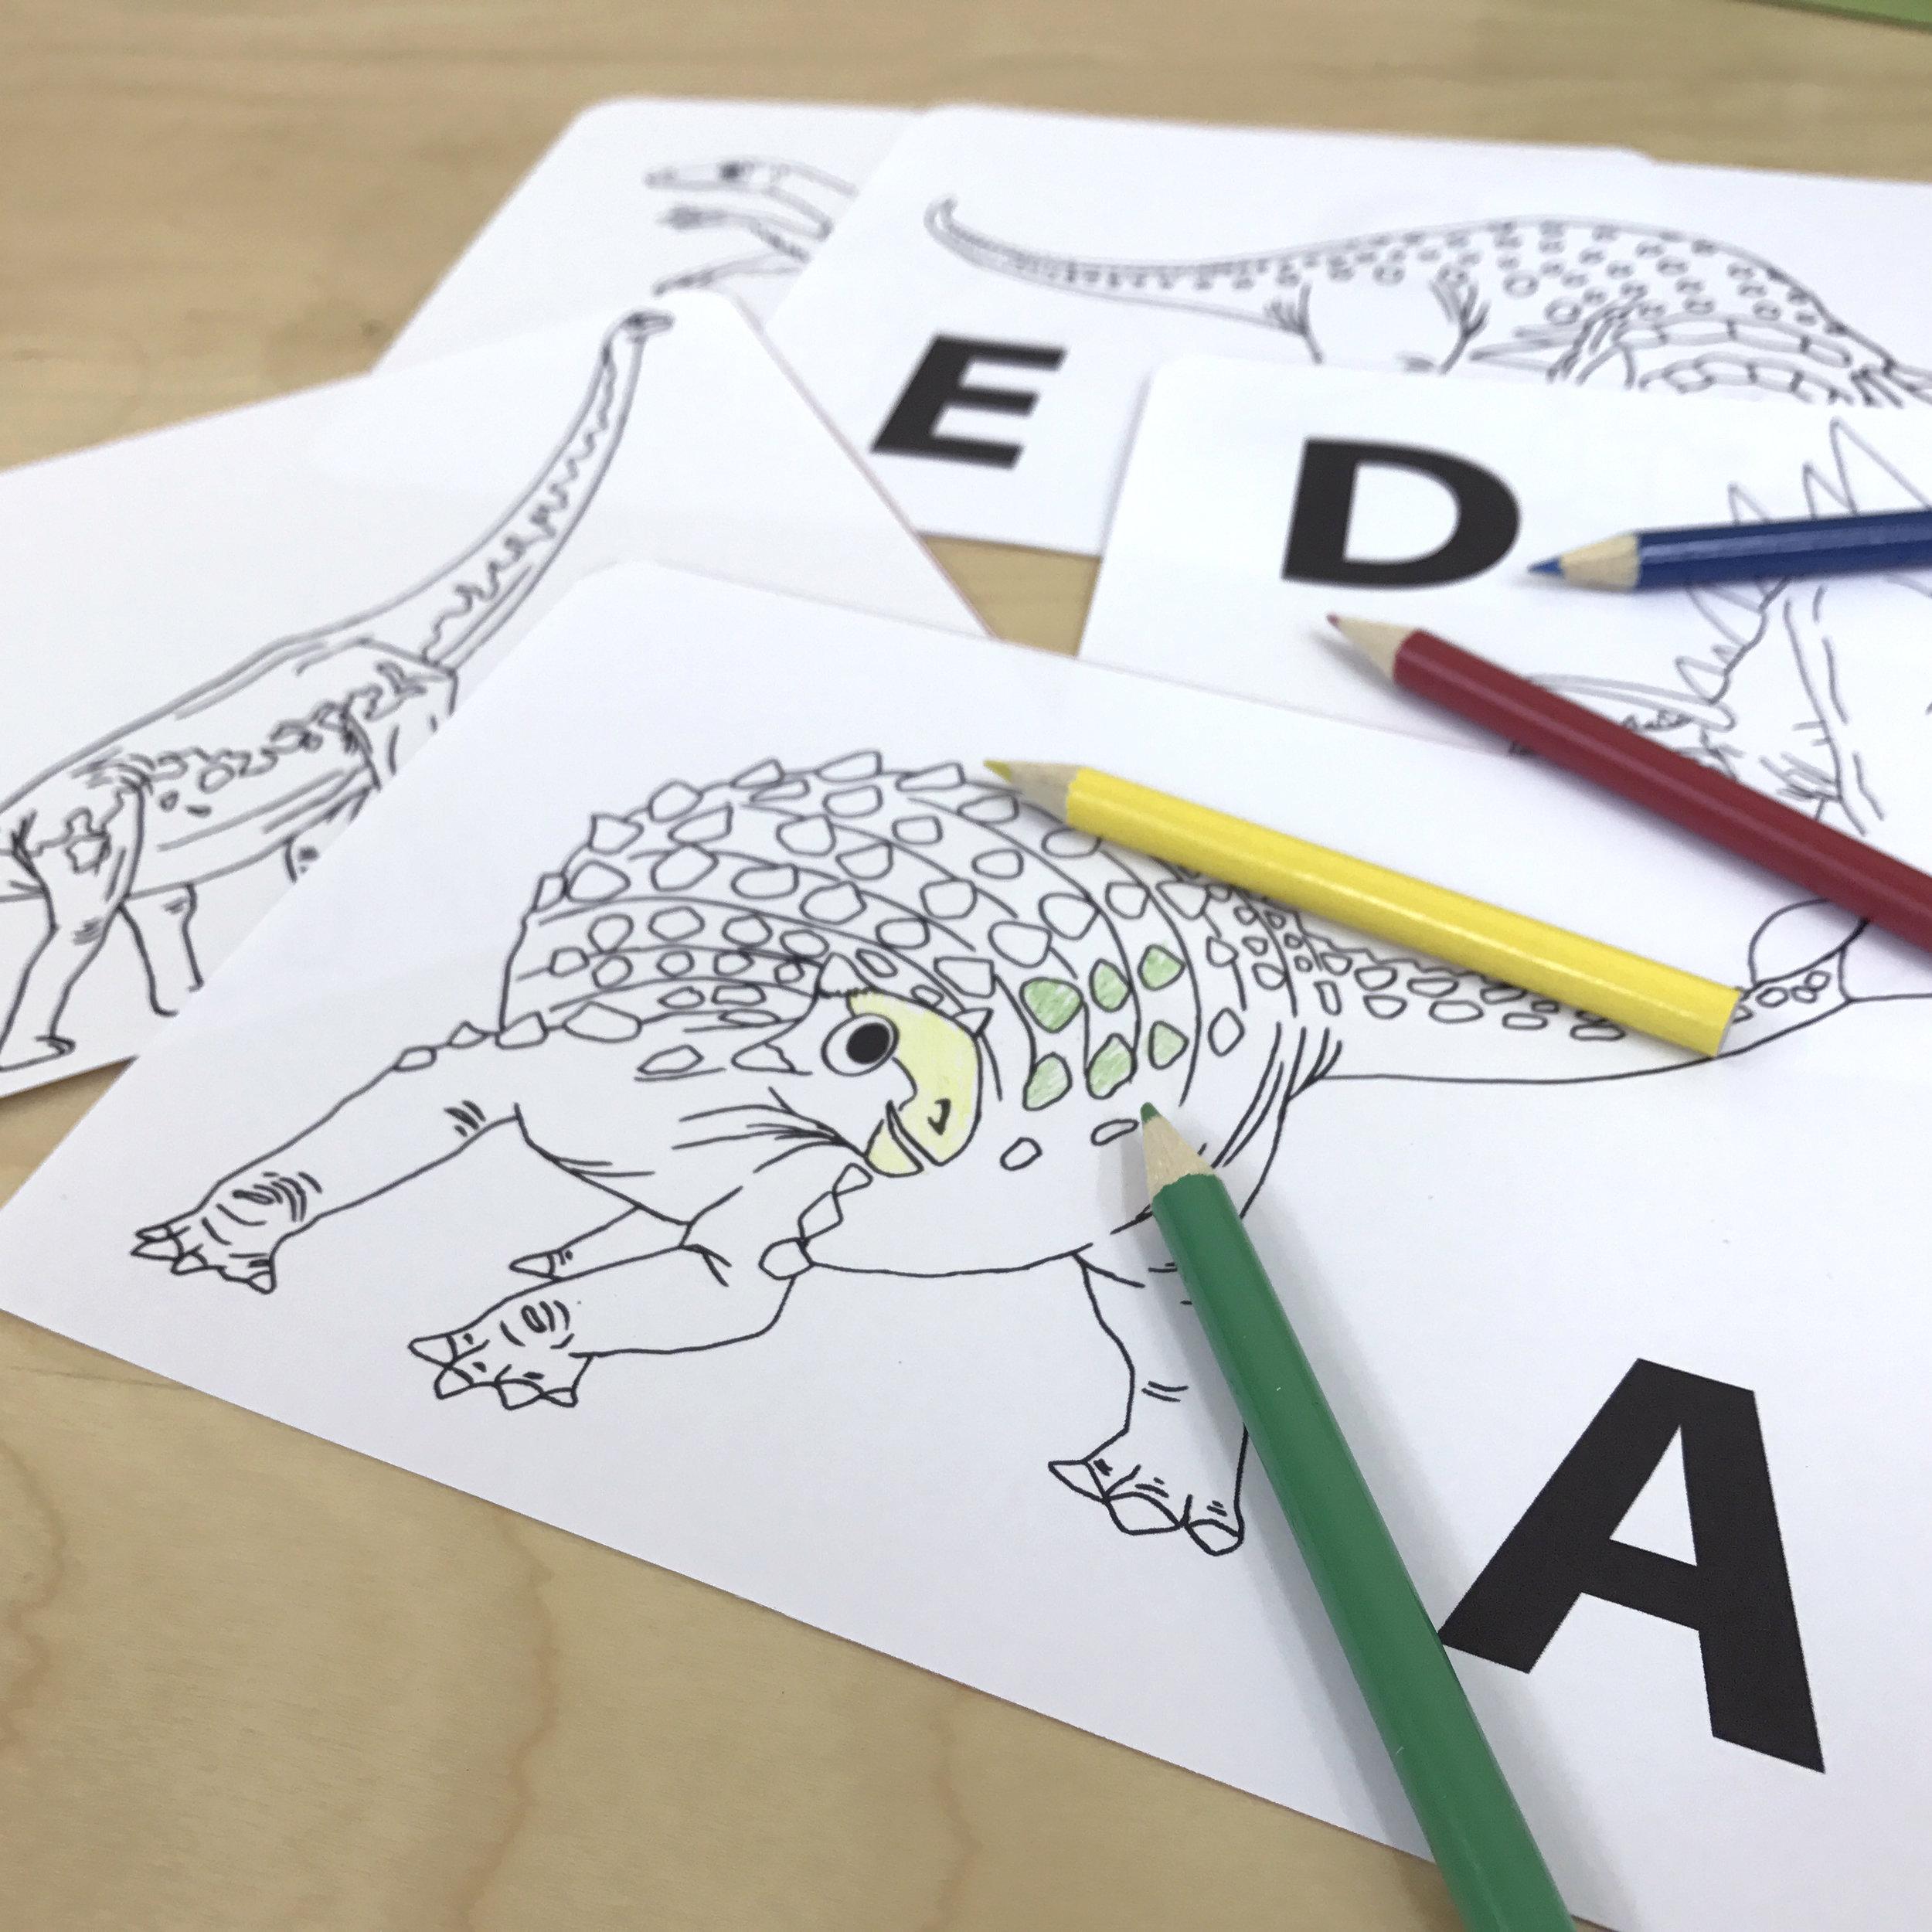 [Colouring activities can enhance children's creativity]